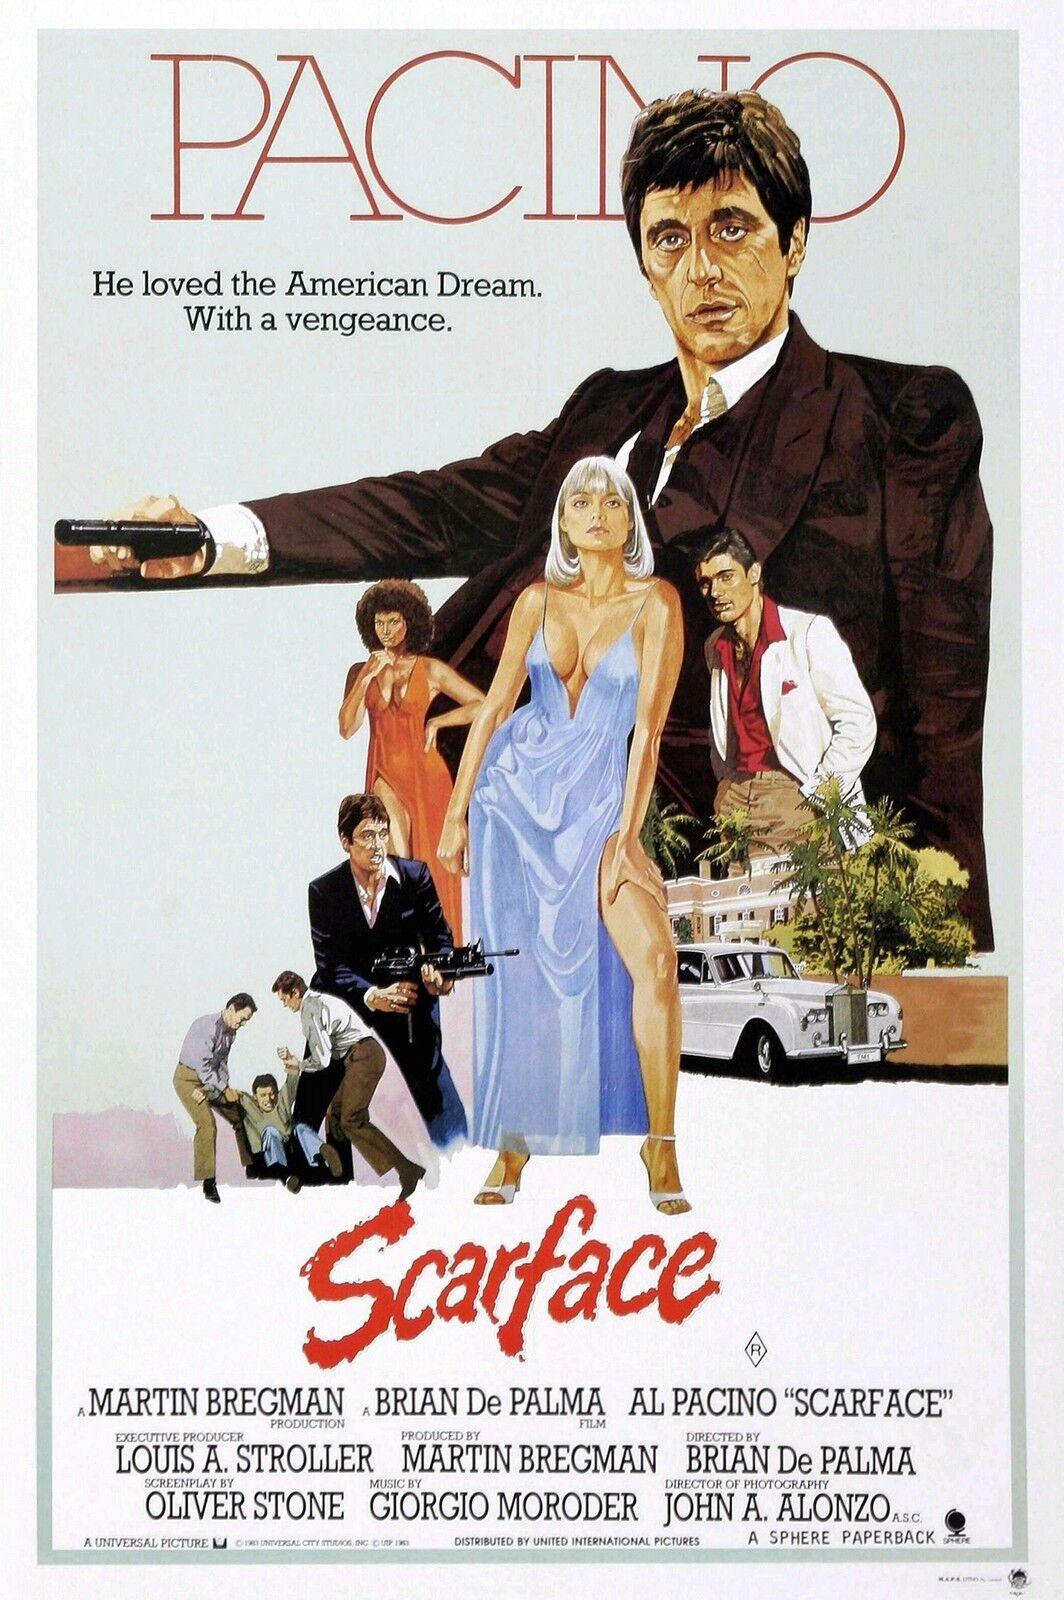 Al Pacino Scarface Home Decor Canvas Print, choose your Größe.